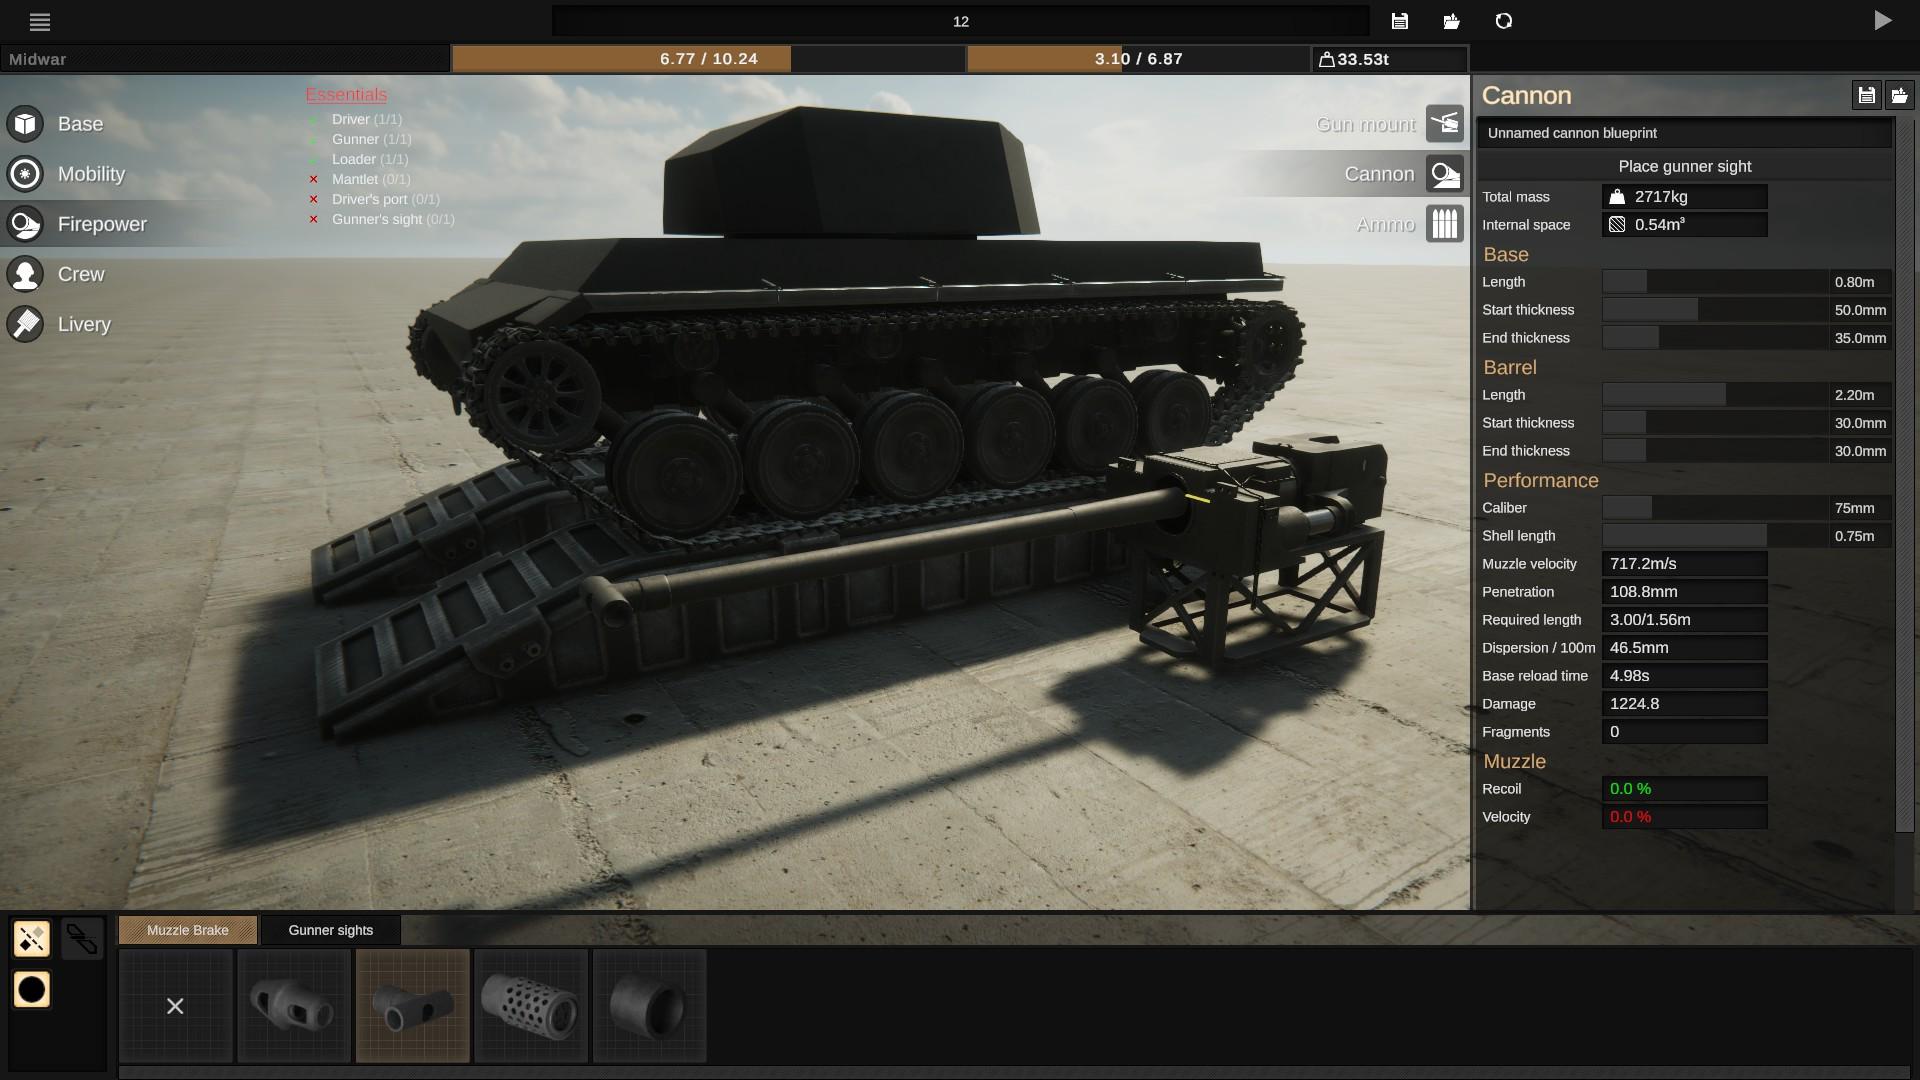 Sprocket - Basic Troubleshooting Steps + Tank Mobility - Firepower - 8262743